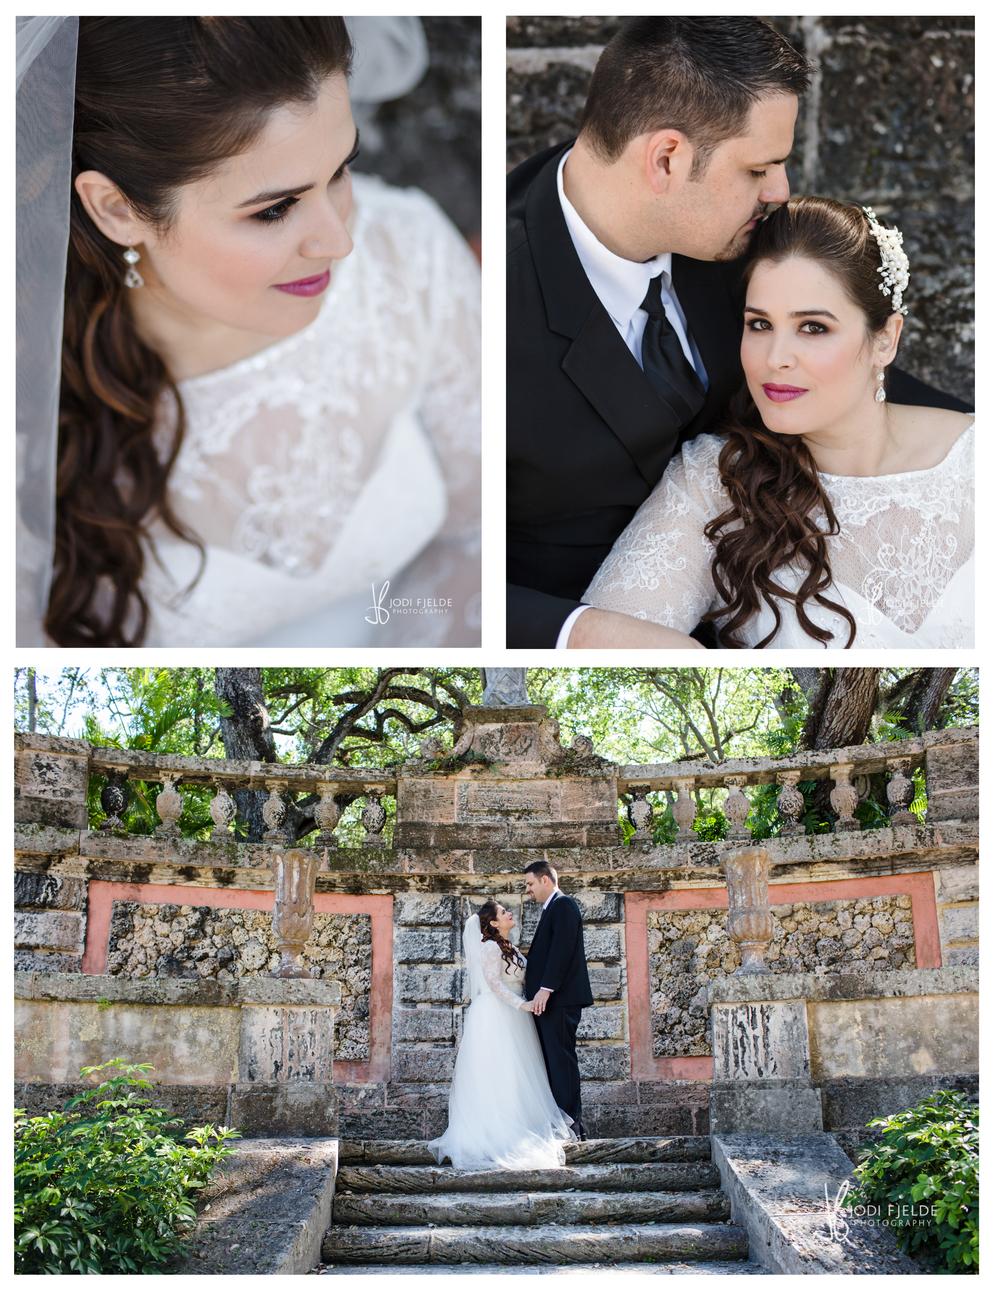 Vizcaya_Miami_Florida_Bridal_Wedding_Portraits_Jodi_Fjelde_Photography-4.jpg